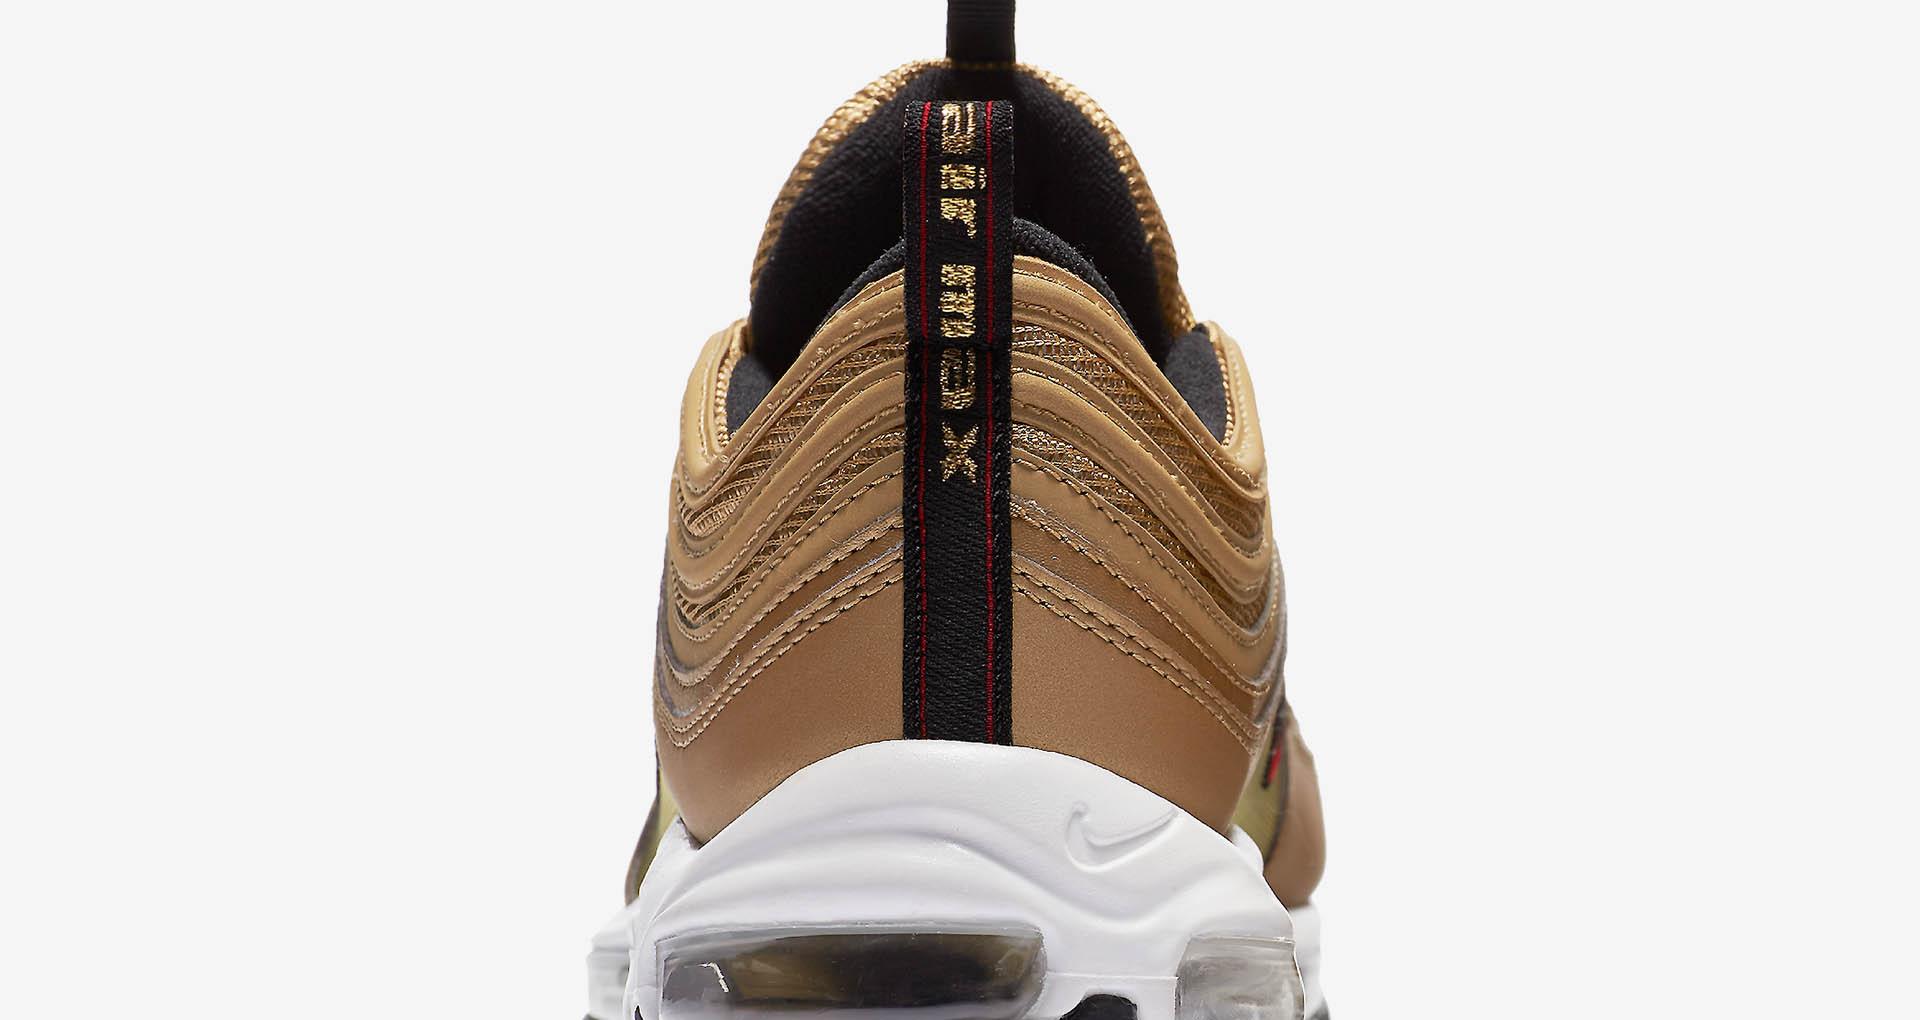 nike-air-max-97-metallic-gold-9